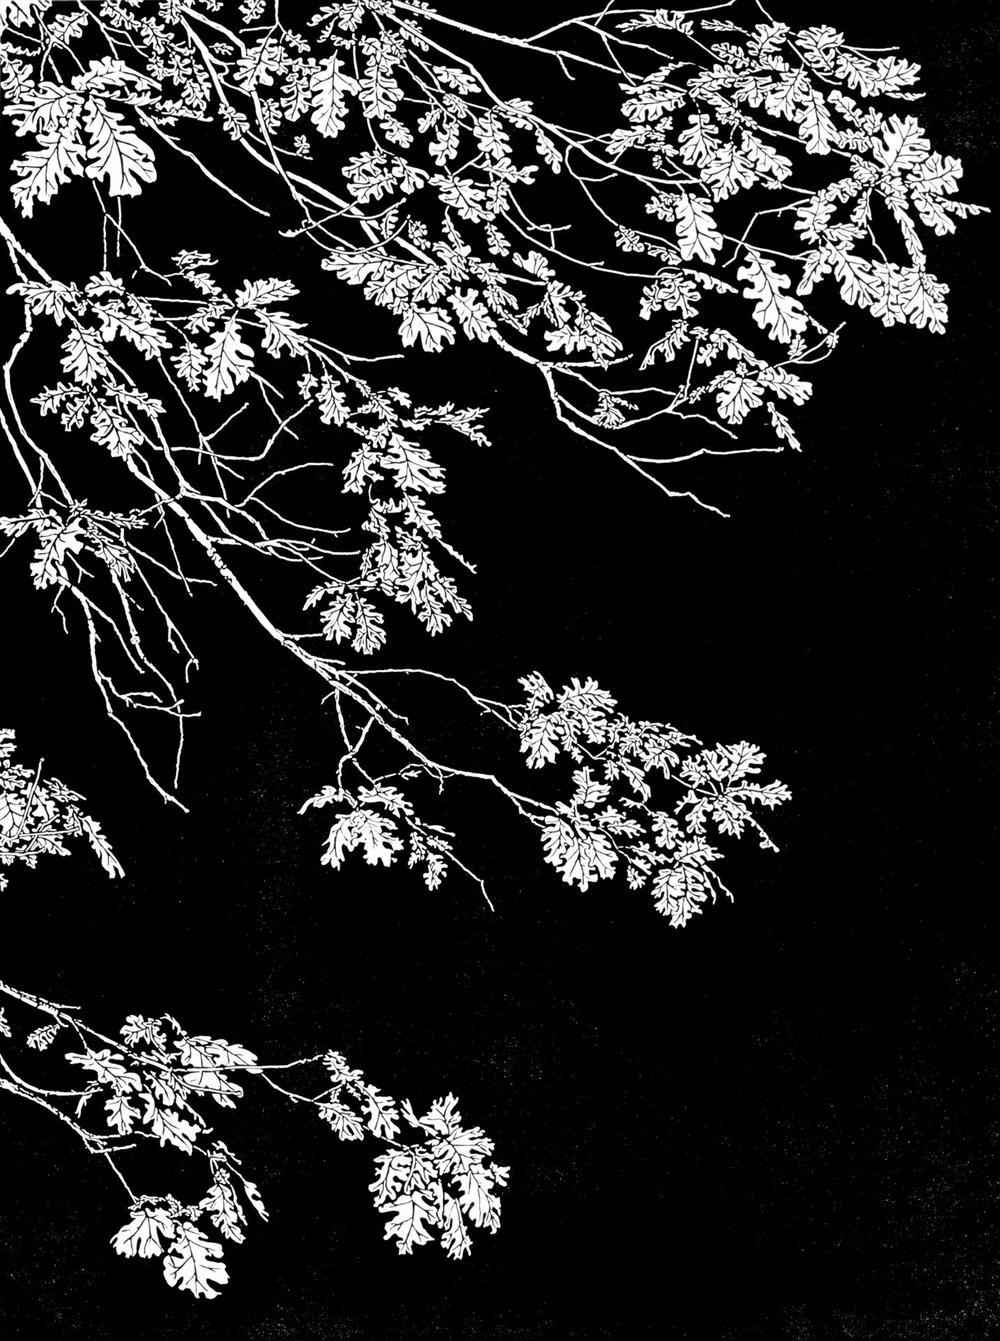 8689-black_oak_-_yosemite-1027201616-39596.jpg